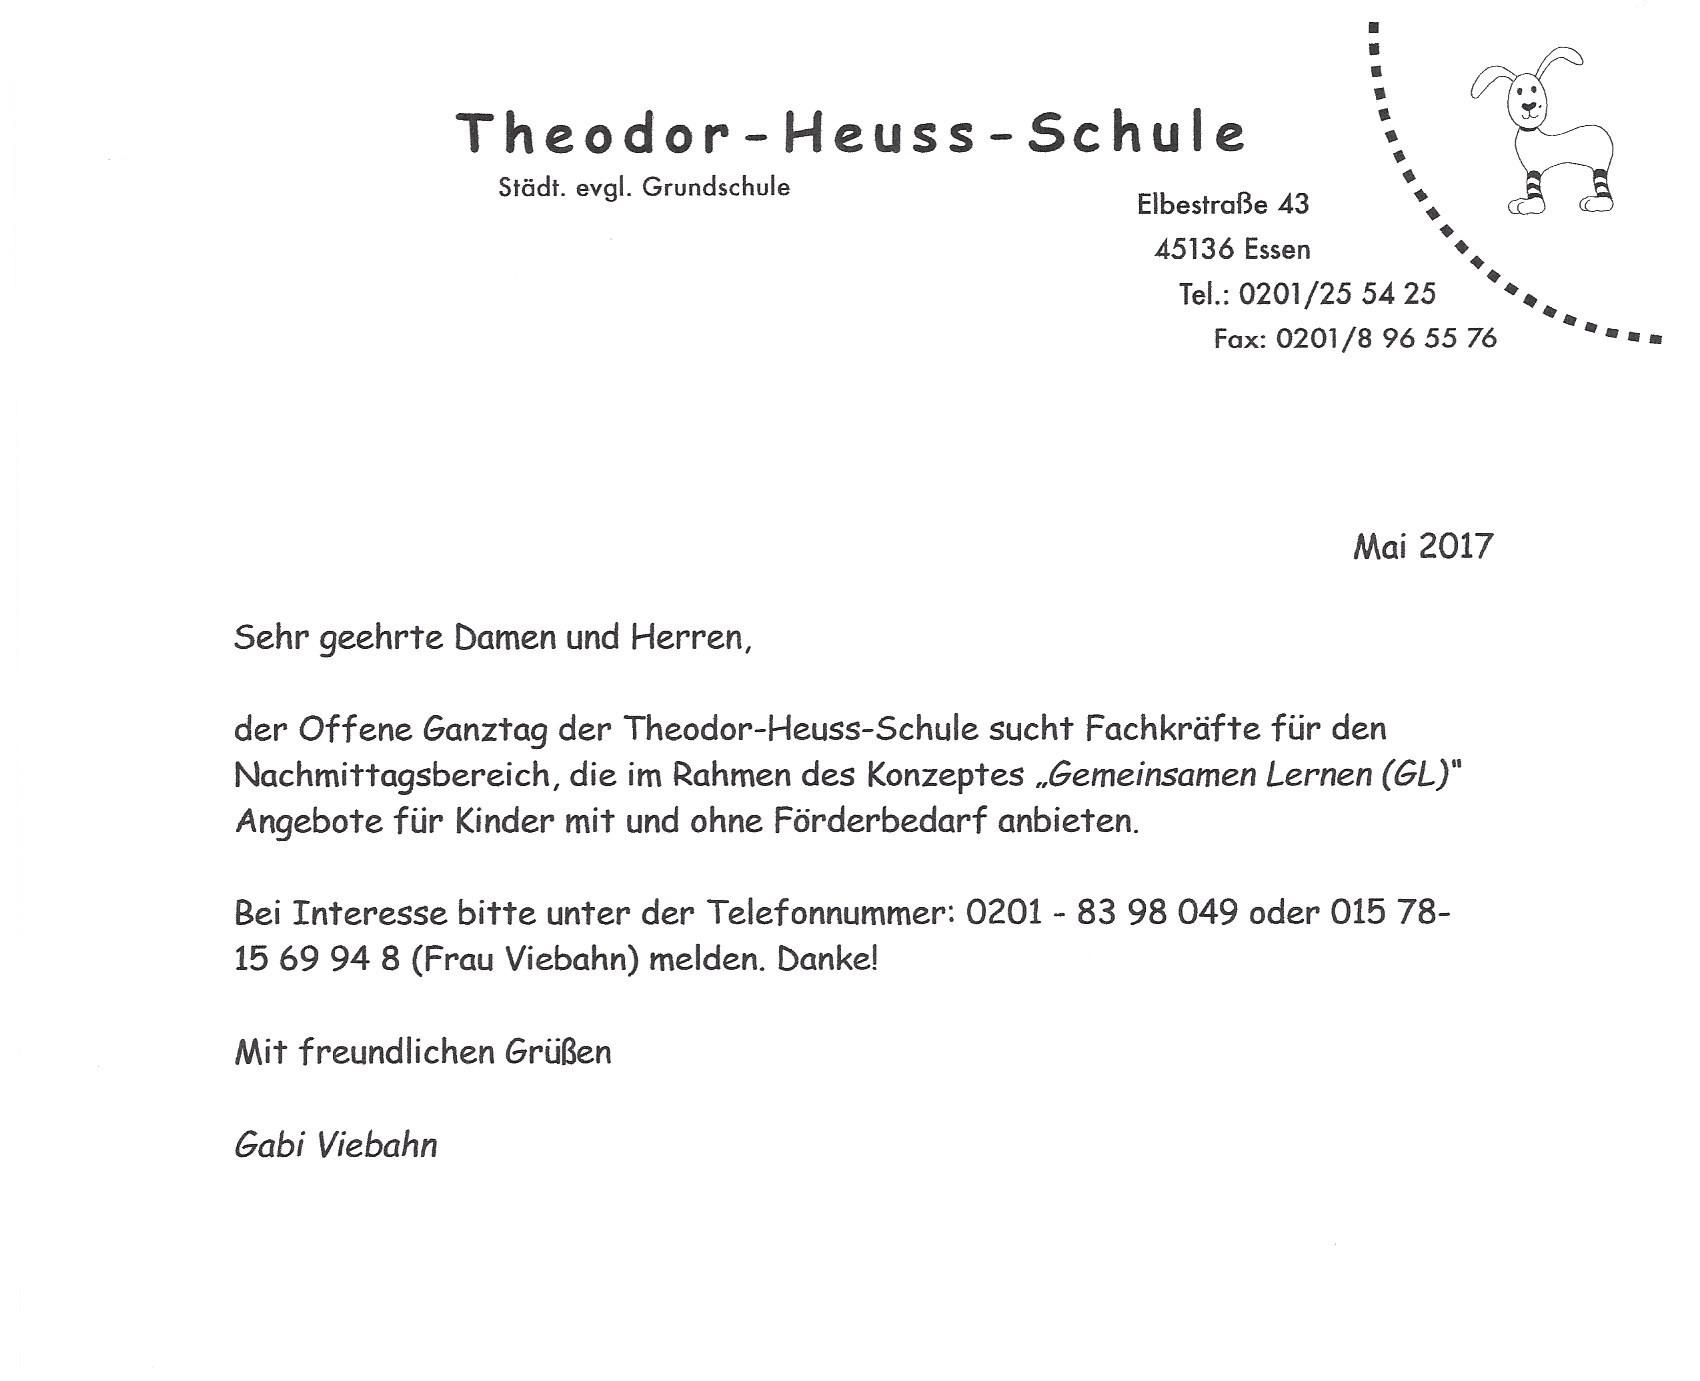 Theodor-Heuss-Schule - Aktuelles